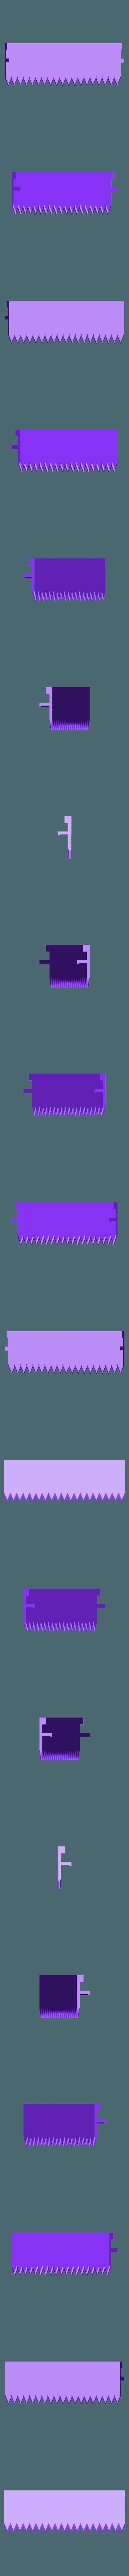 "devidoir_lame_coupe01.STL Download free STL file ""Monsteranimal T-Rex"" tape dispenser • 3D print design, Tibe-Design"